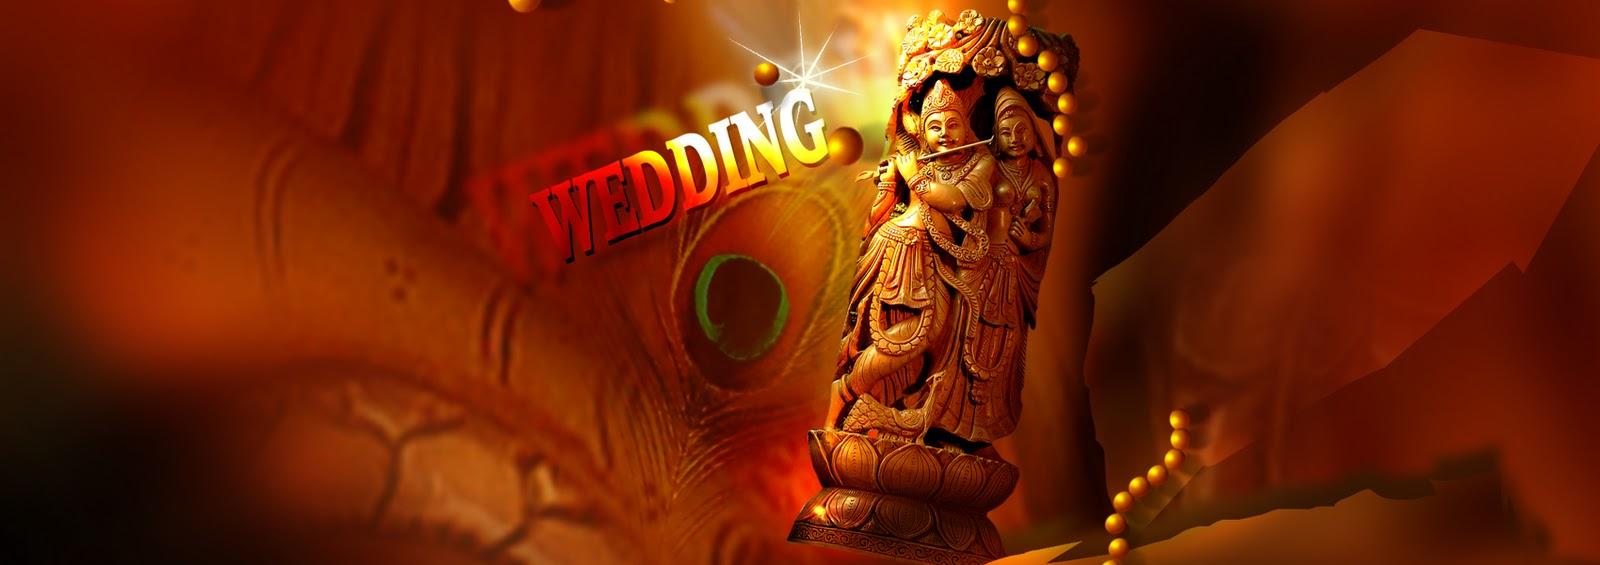 Czeshop Images Indian Wedding Banner Background Hd